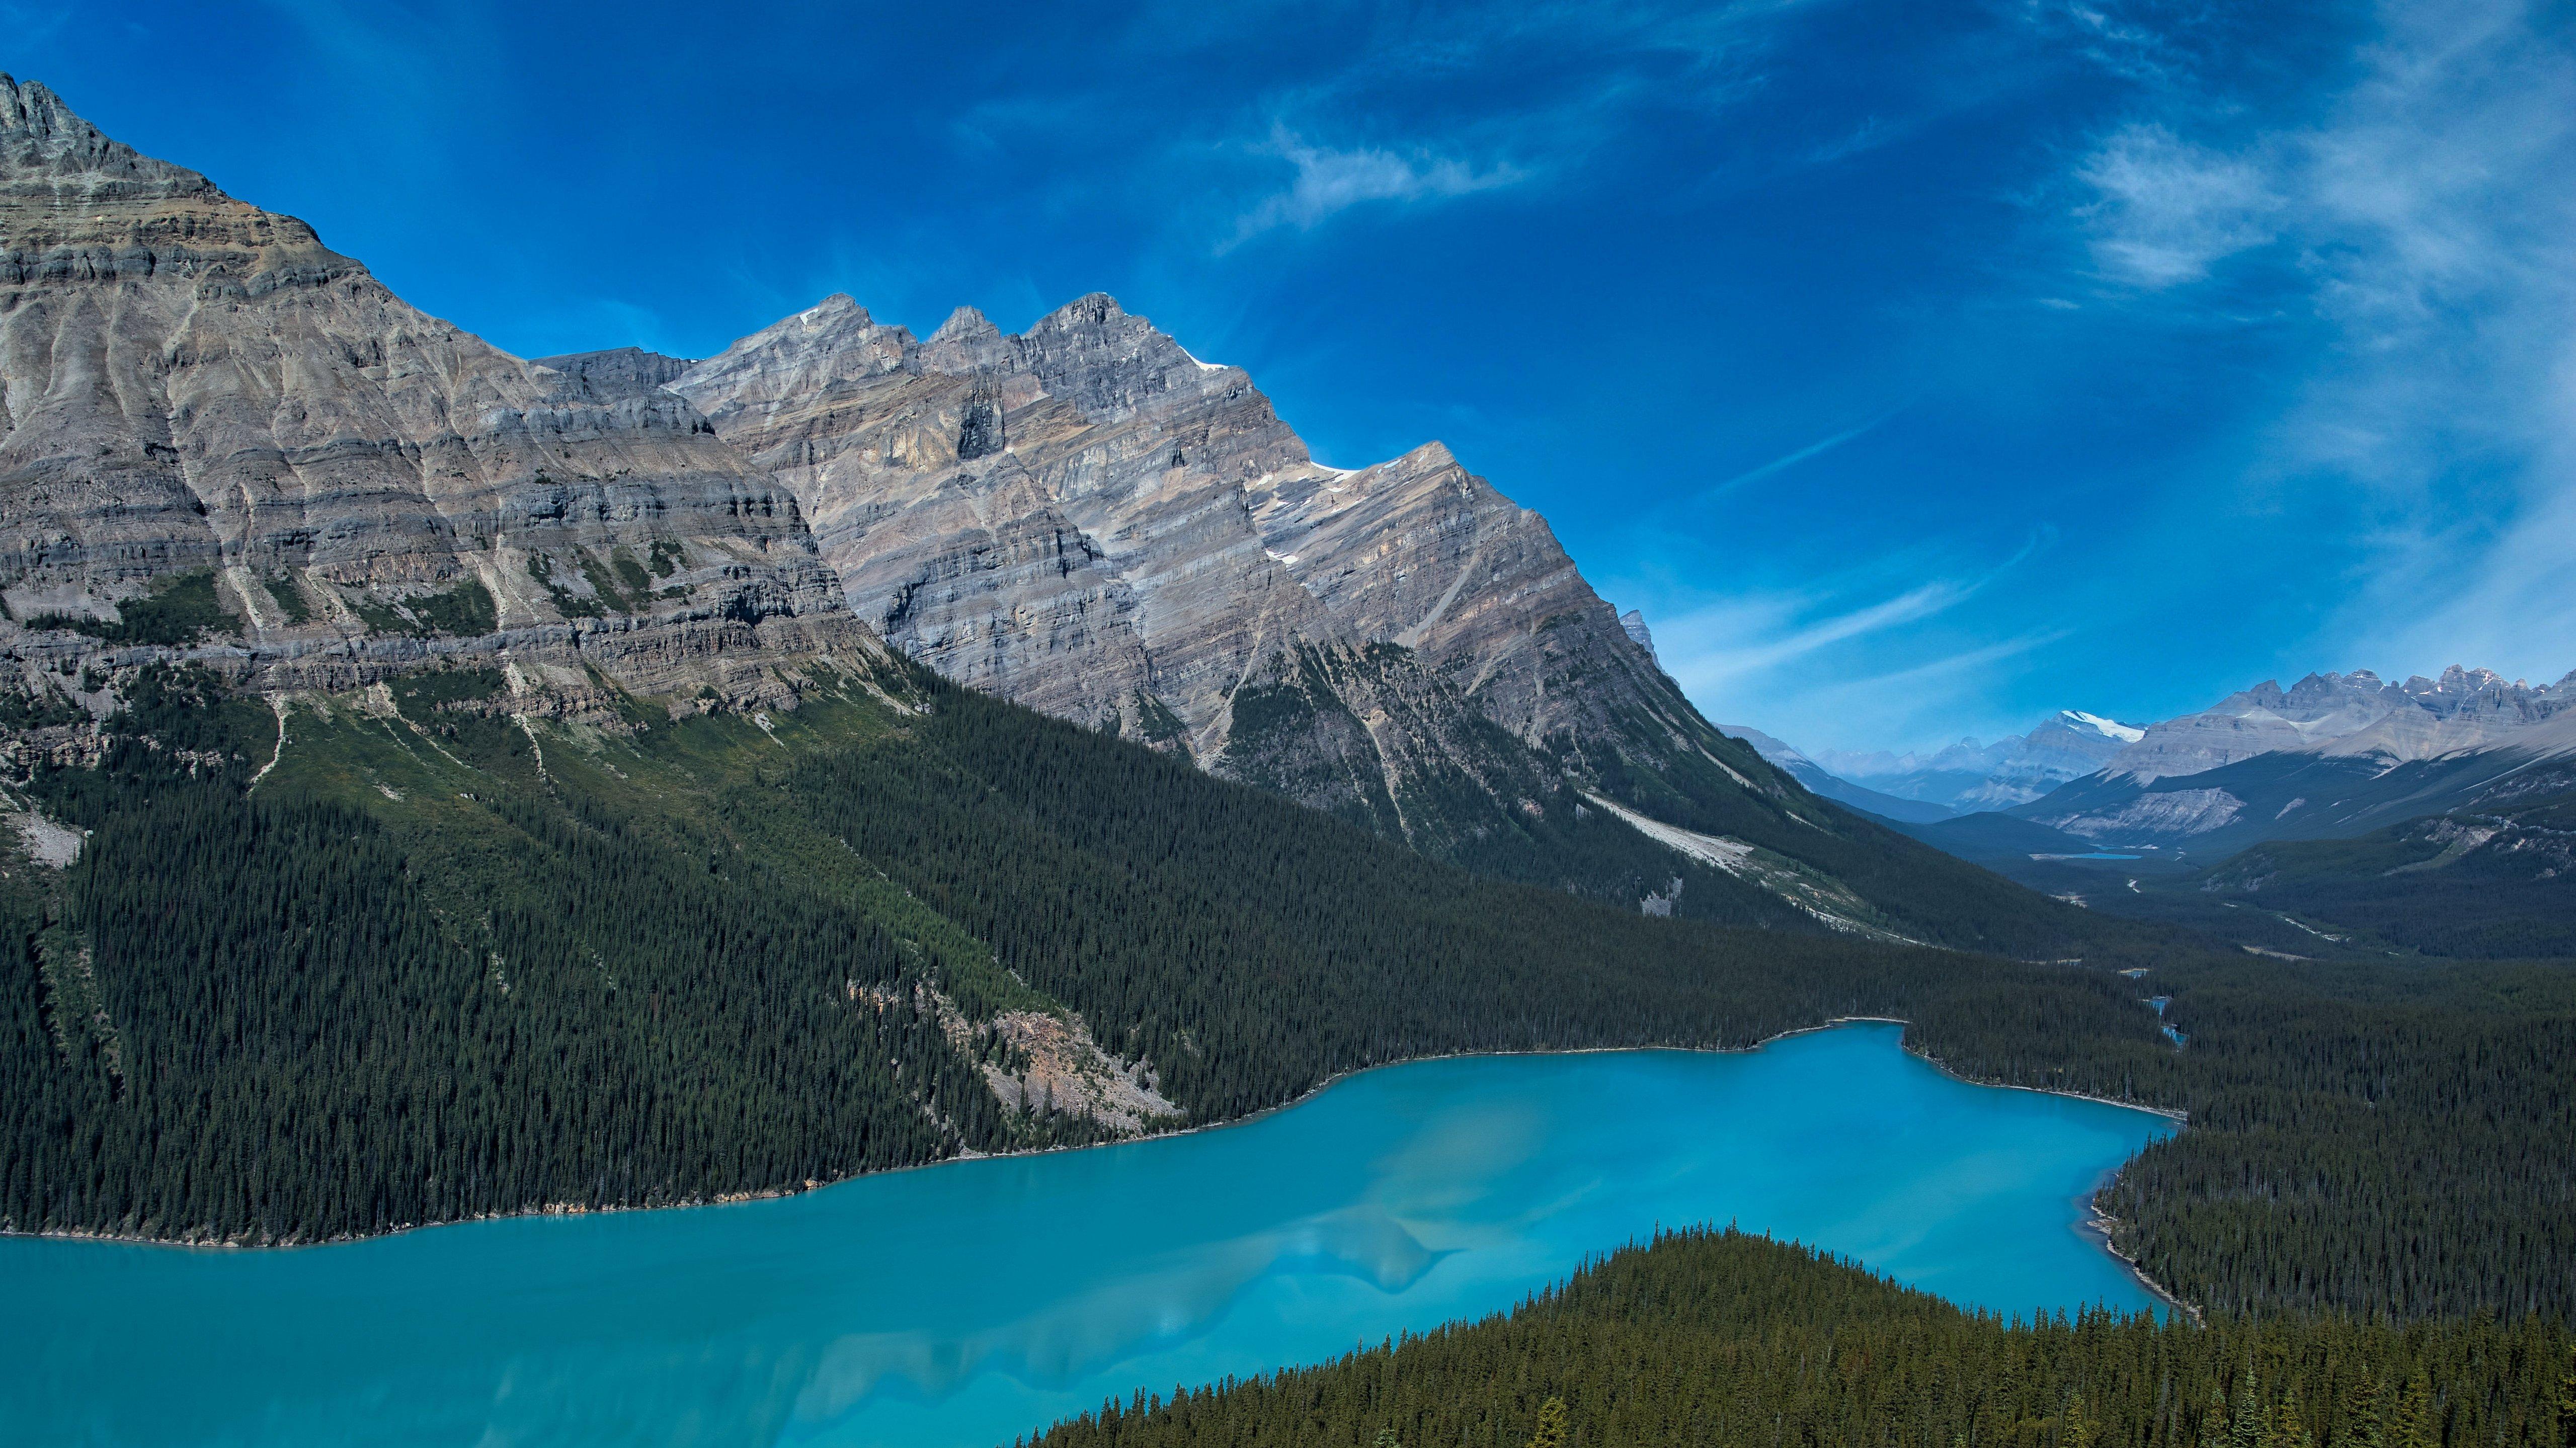 Fondos de pantalla Parque Nacional Banff en Canada